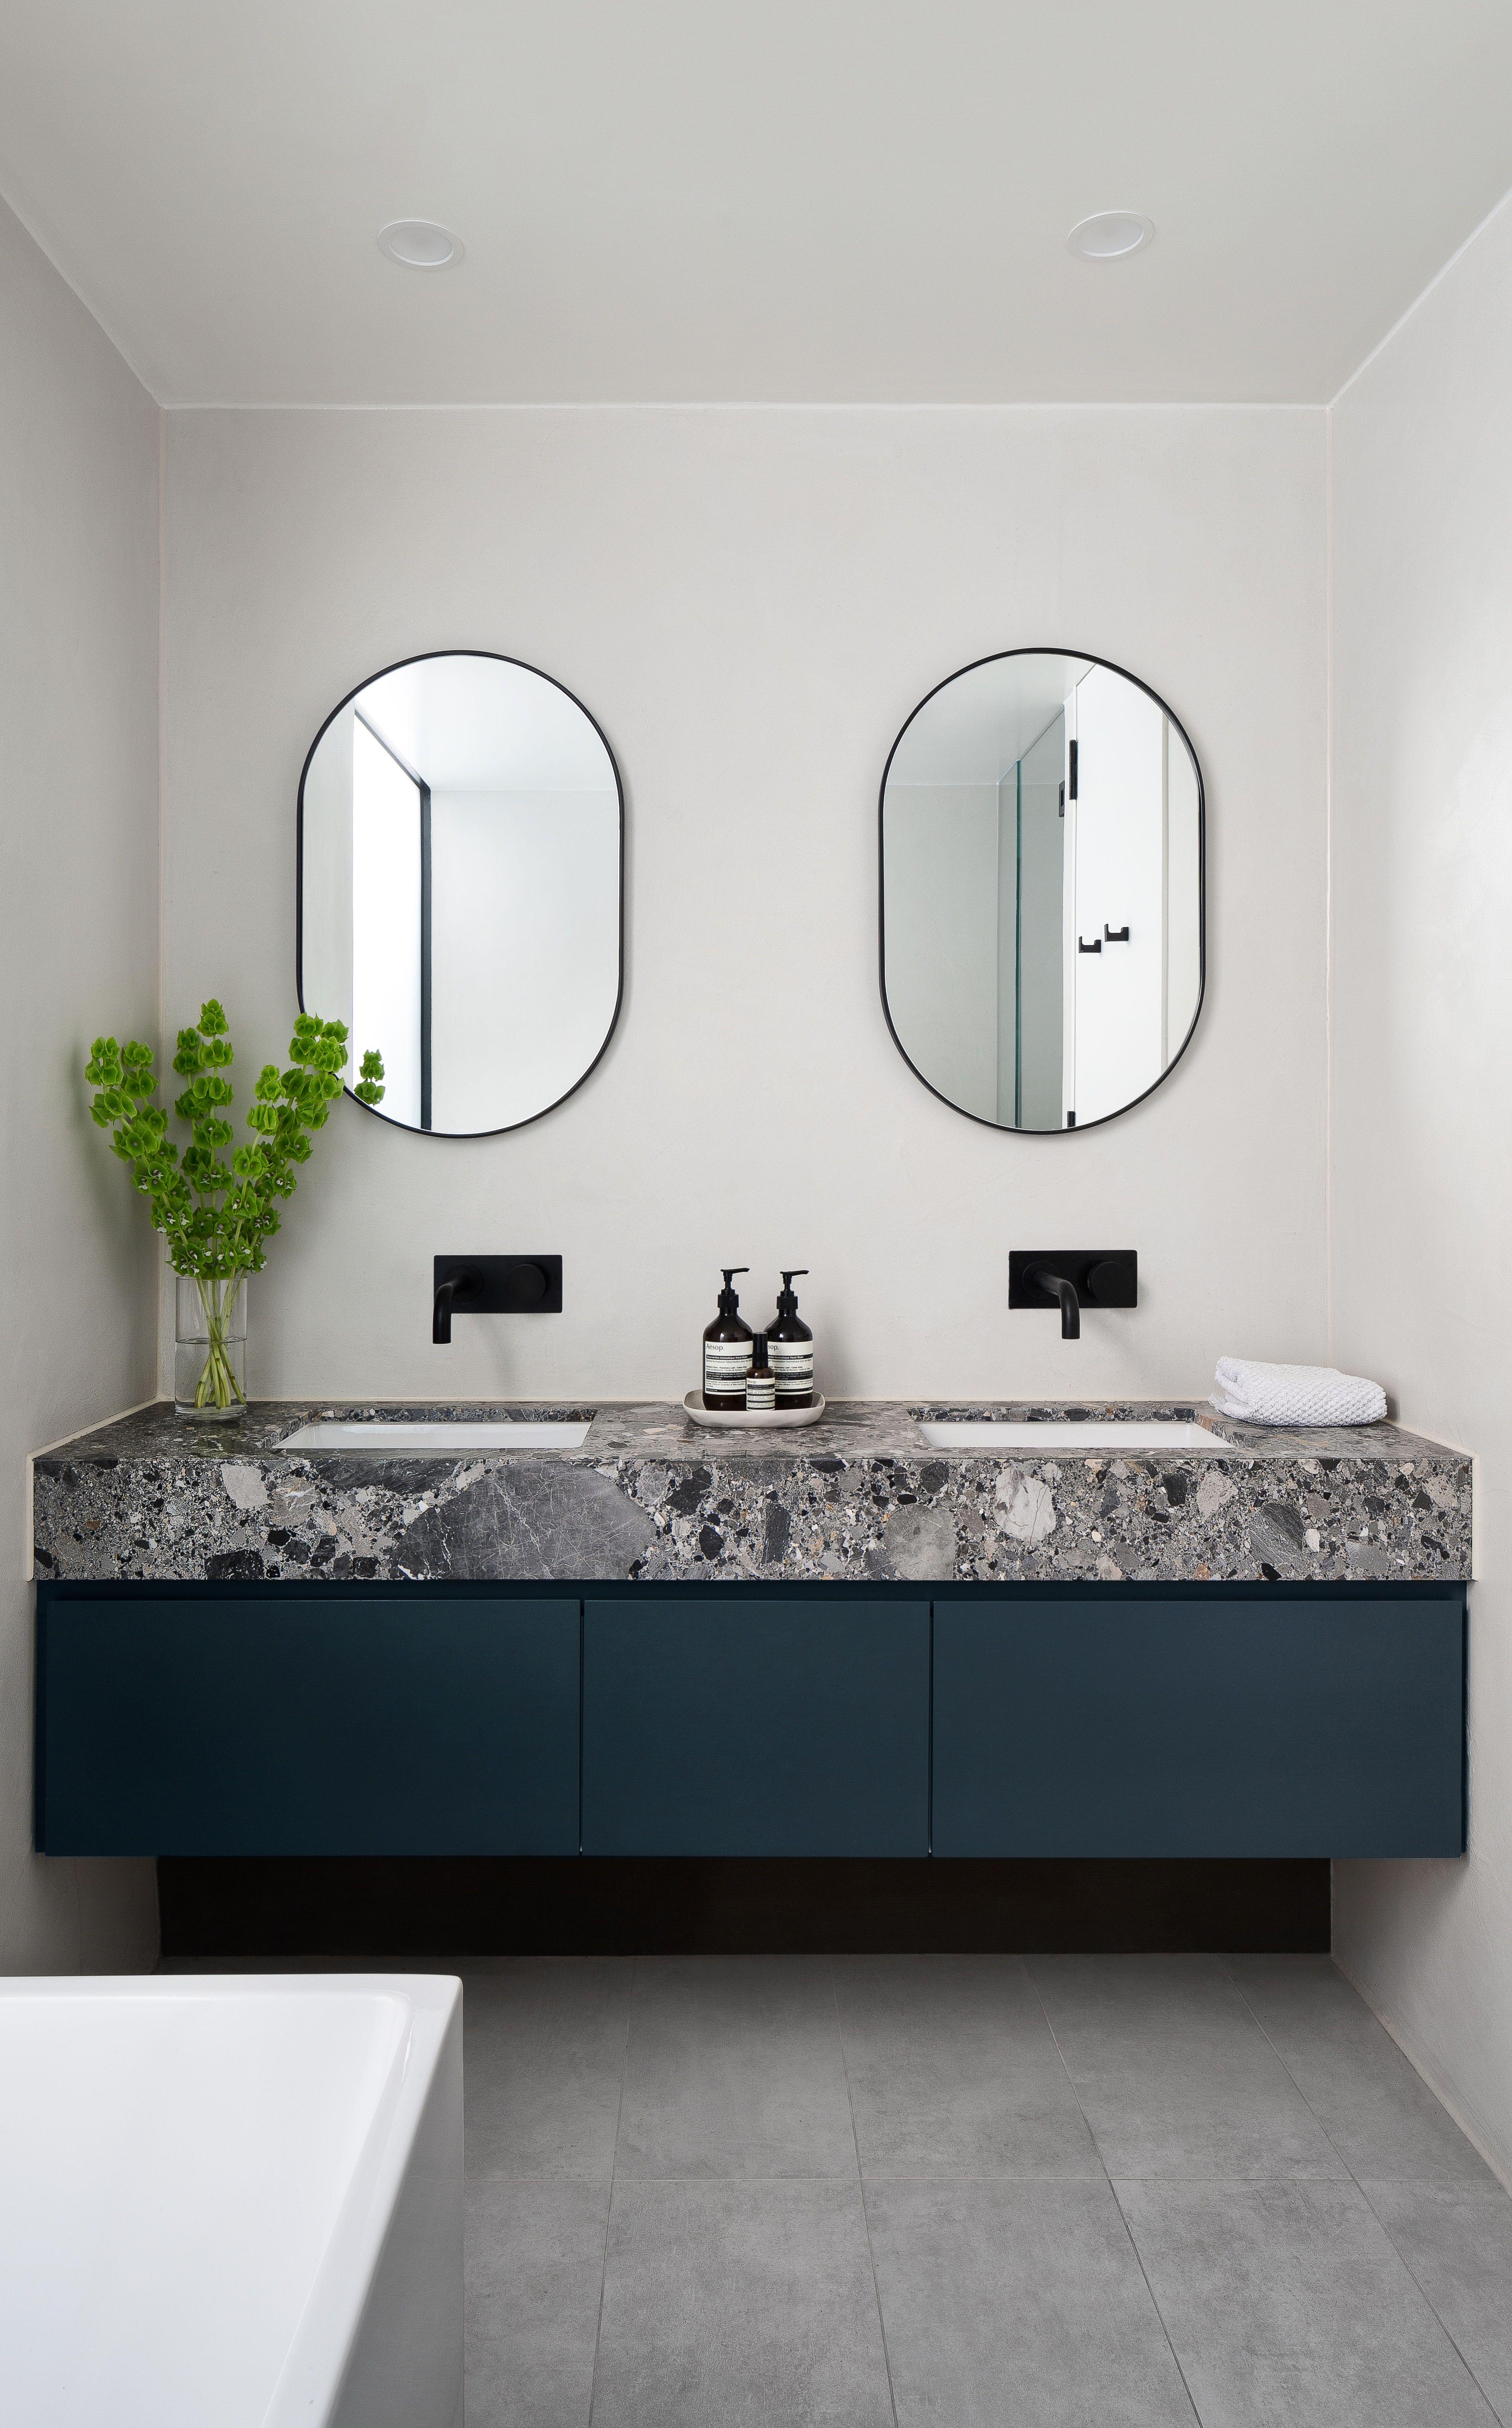 Commercial Road | Bathroom design, Modern bathroom, Bathroom